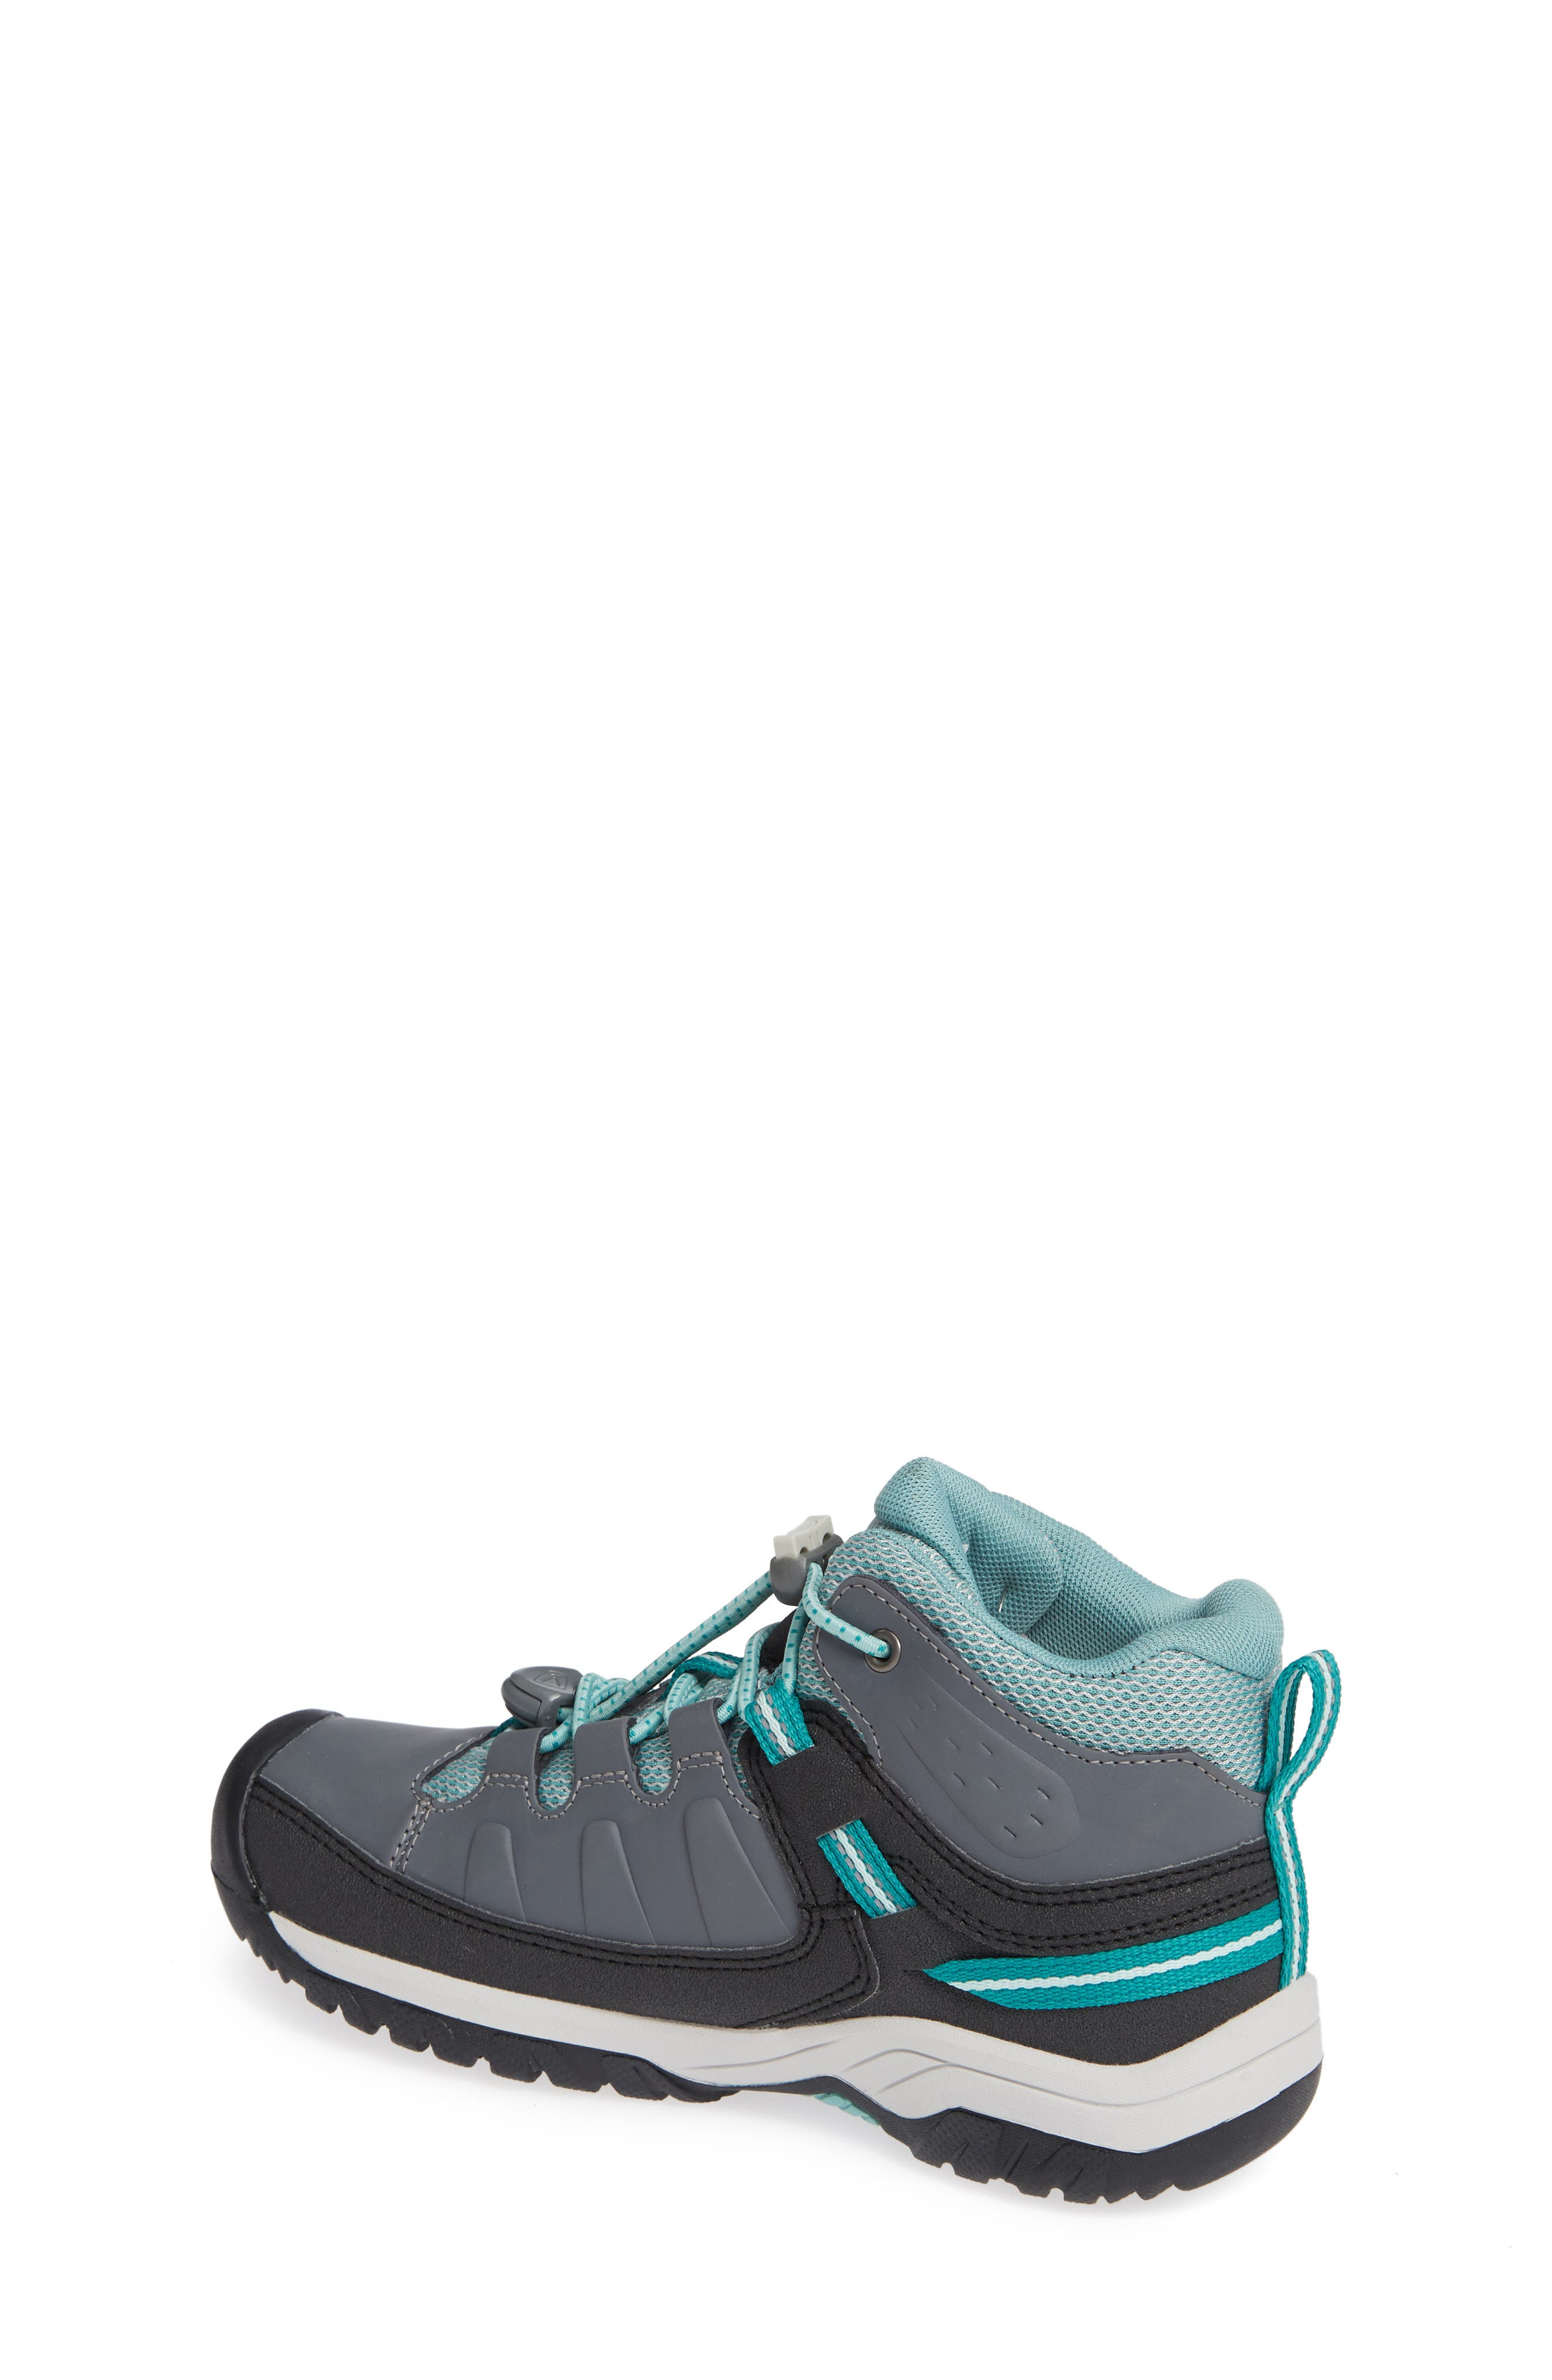 KEEN, Targhee Mid Waterproof Hiking Boot, Alternate thumbnail 2, color, GREY/ WASABI